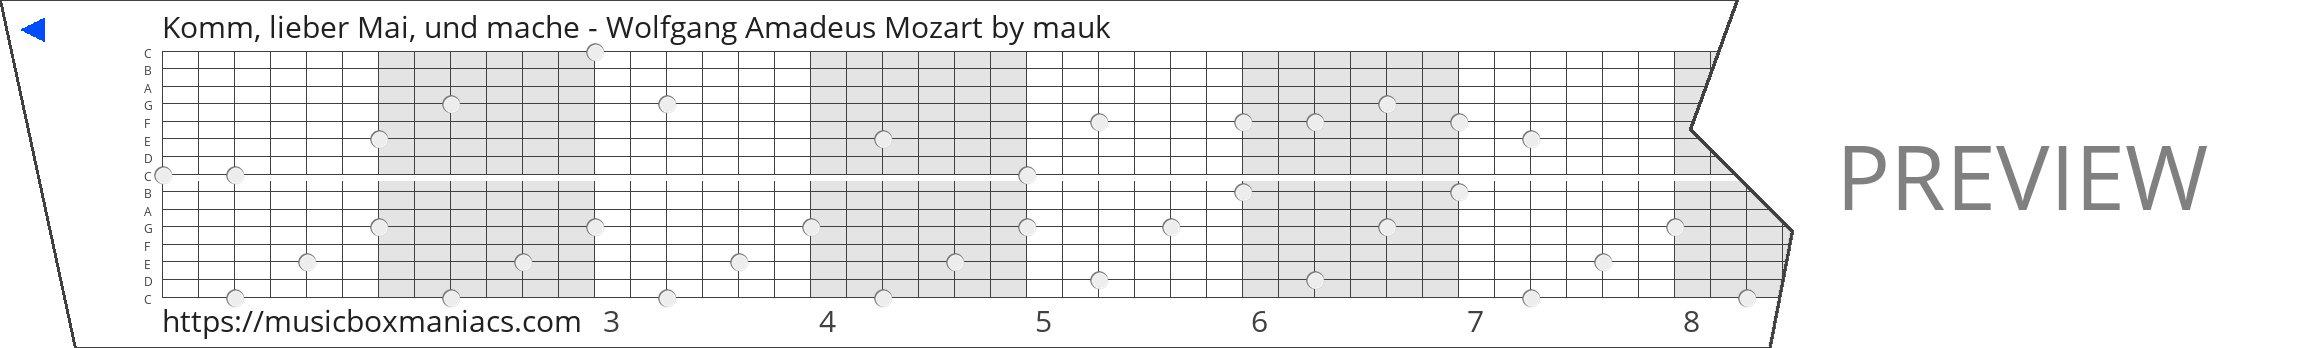 Komm, lieber Mai, und mache - Wolfgang Amadeus Mozart 15 note music box paper strip